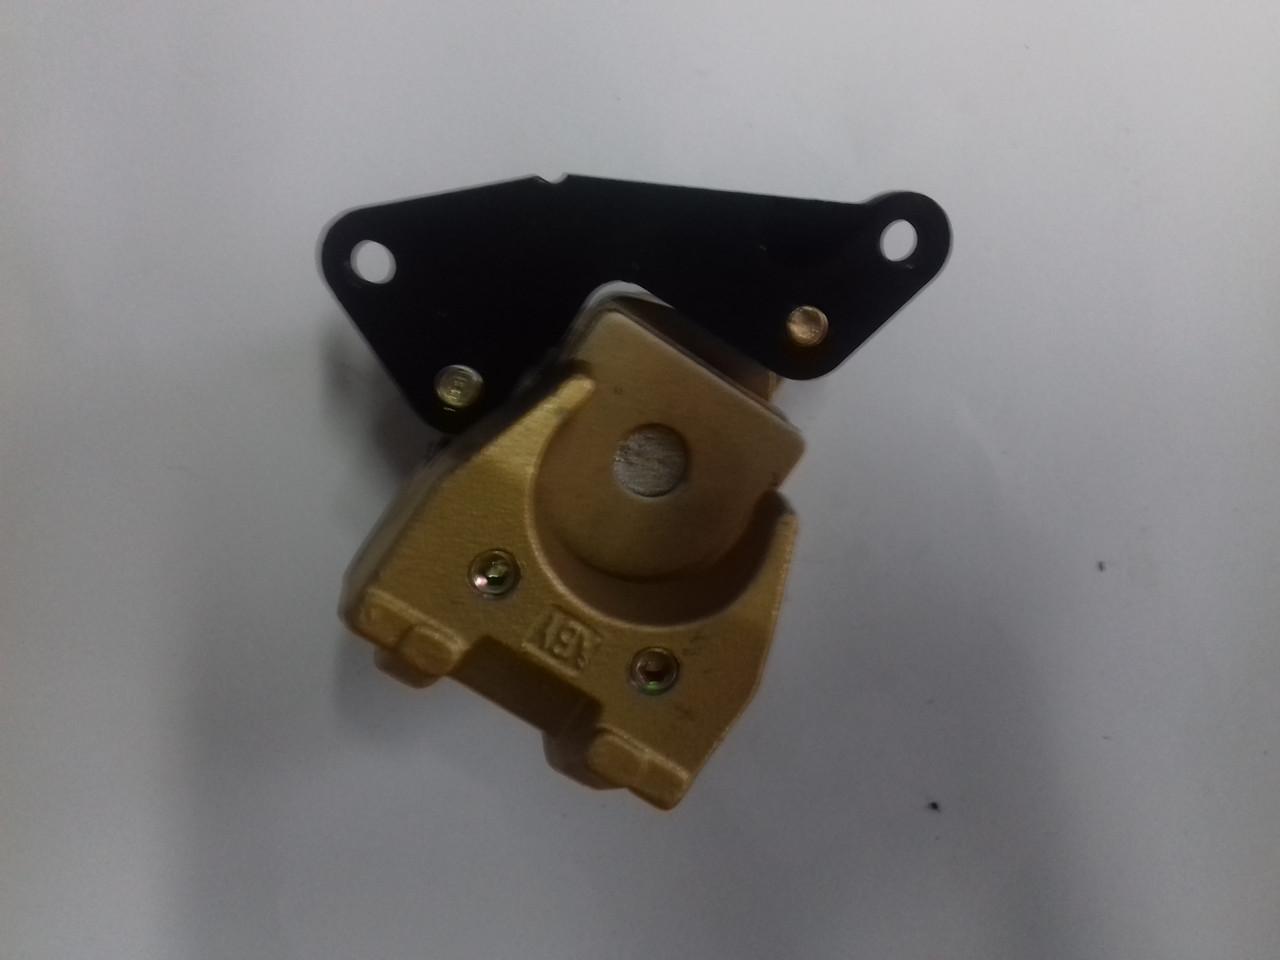 Суппорт тормозной передний однопоршневой Honda DIO, TACT LIPAI